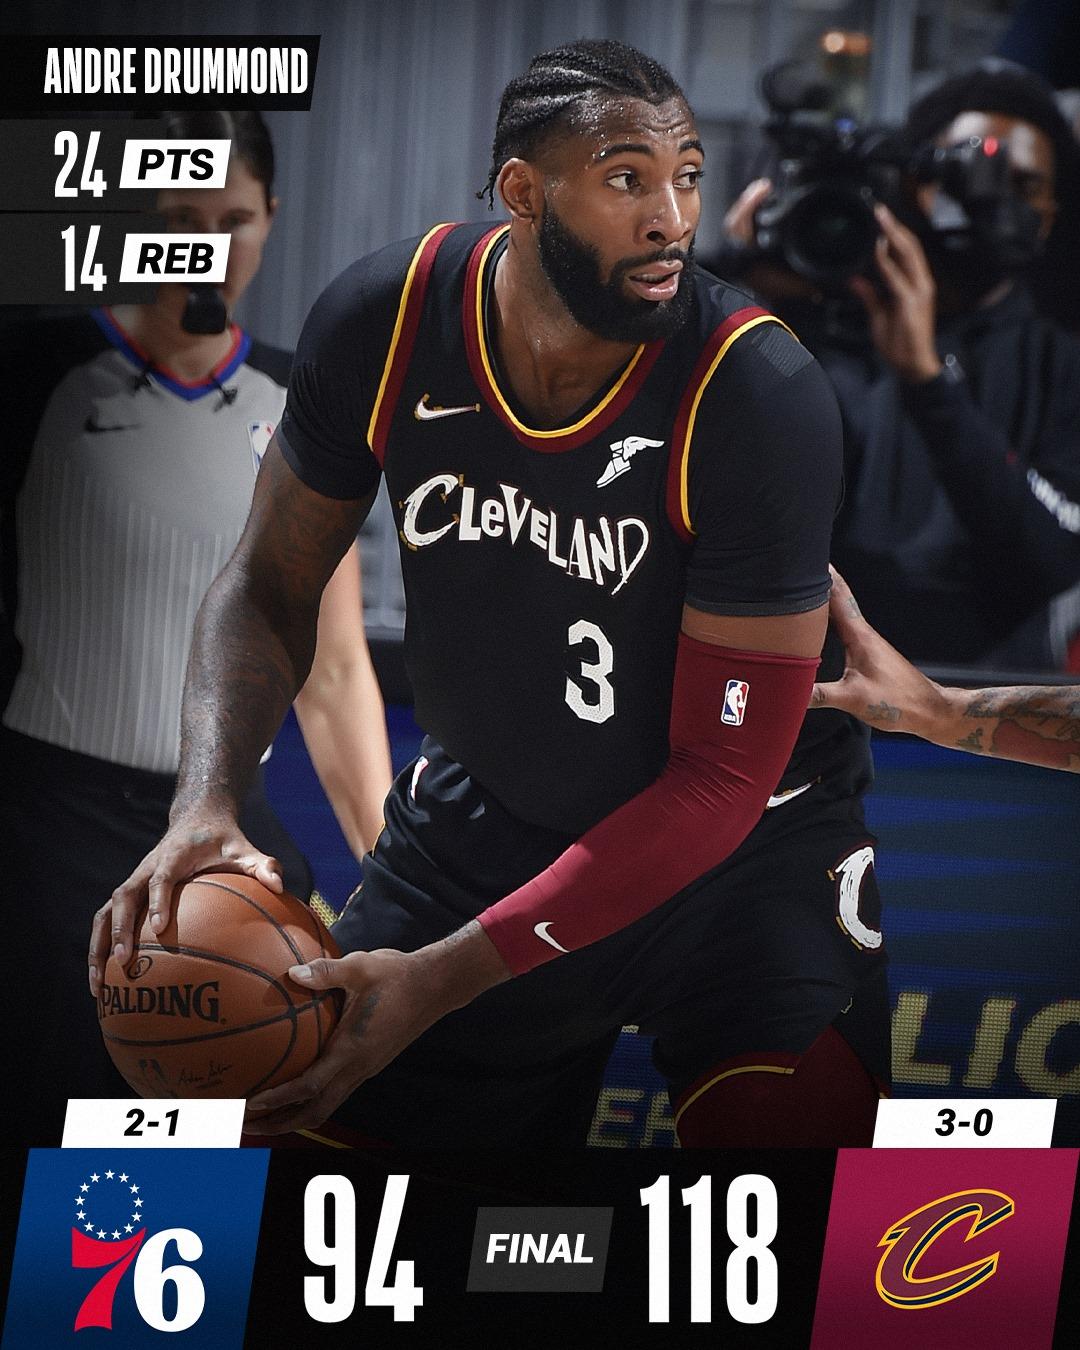 28-12-5